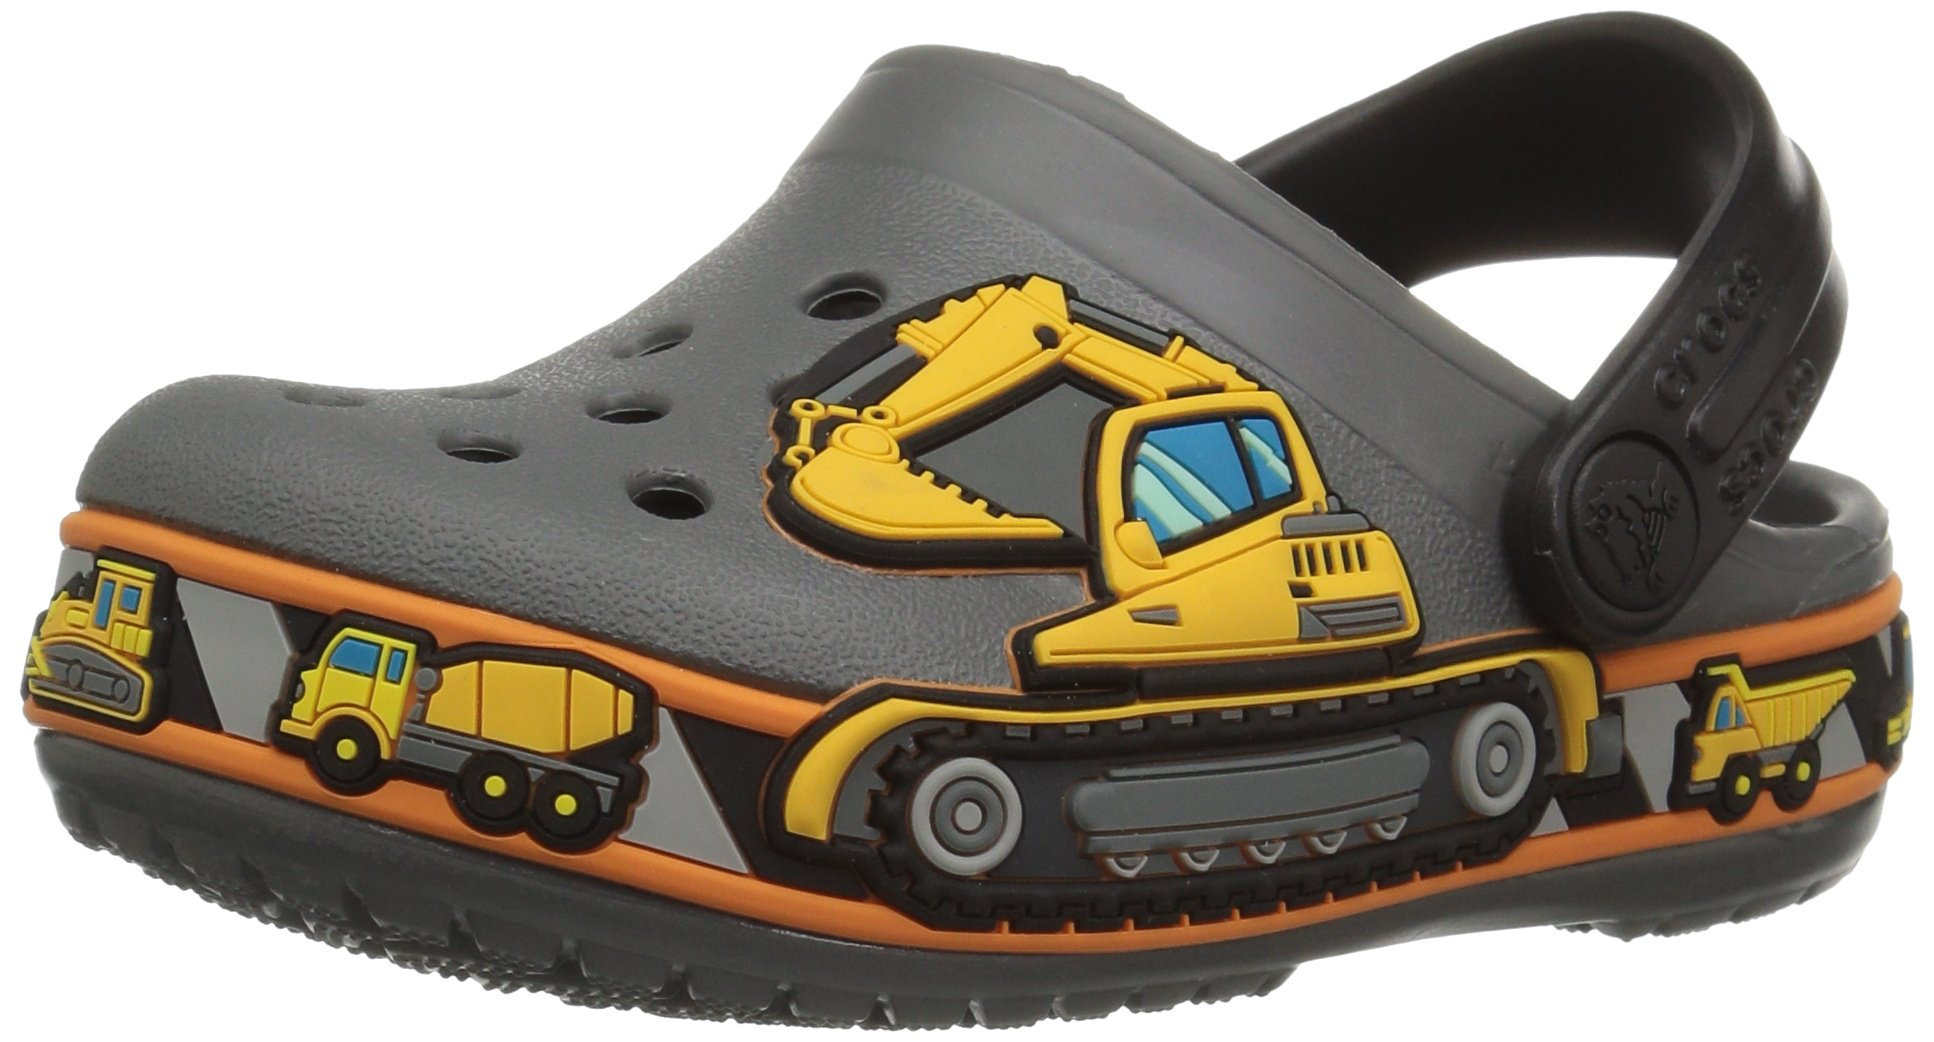 Crocs Unisex-Kids CB Fun Lab Graphic Clg K-Construction Clog, Slate Grey, 13 M US Little Kid